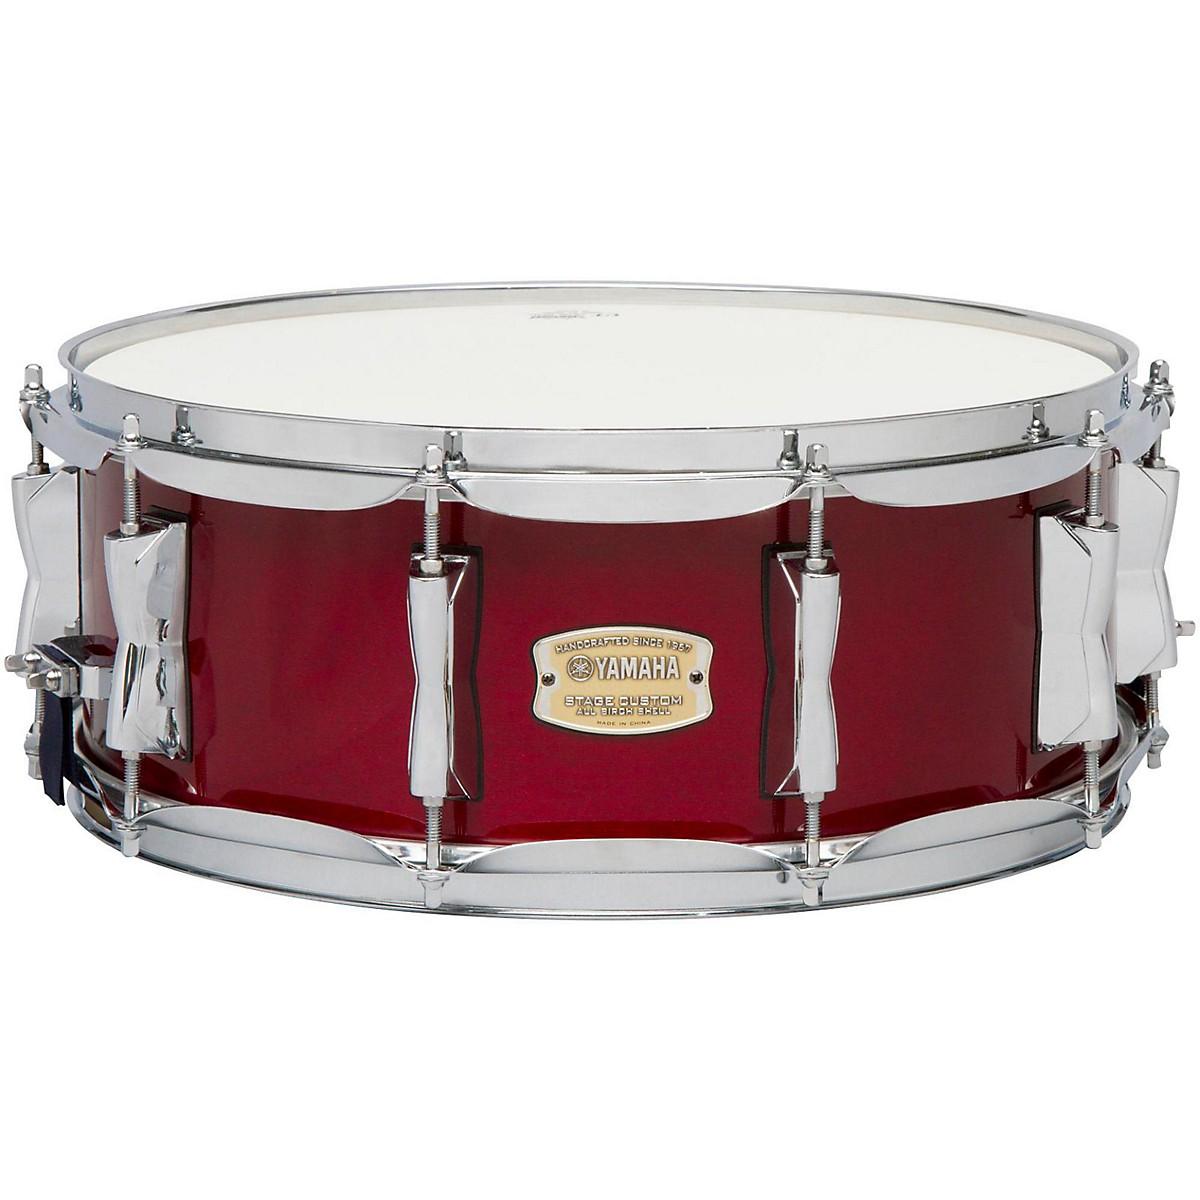 Yamaha Stage Custom Birch Snare 14x5.5